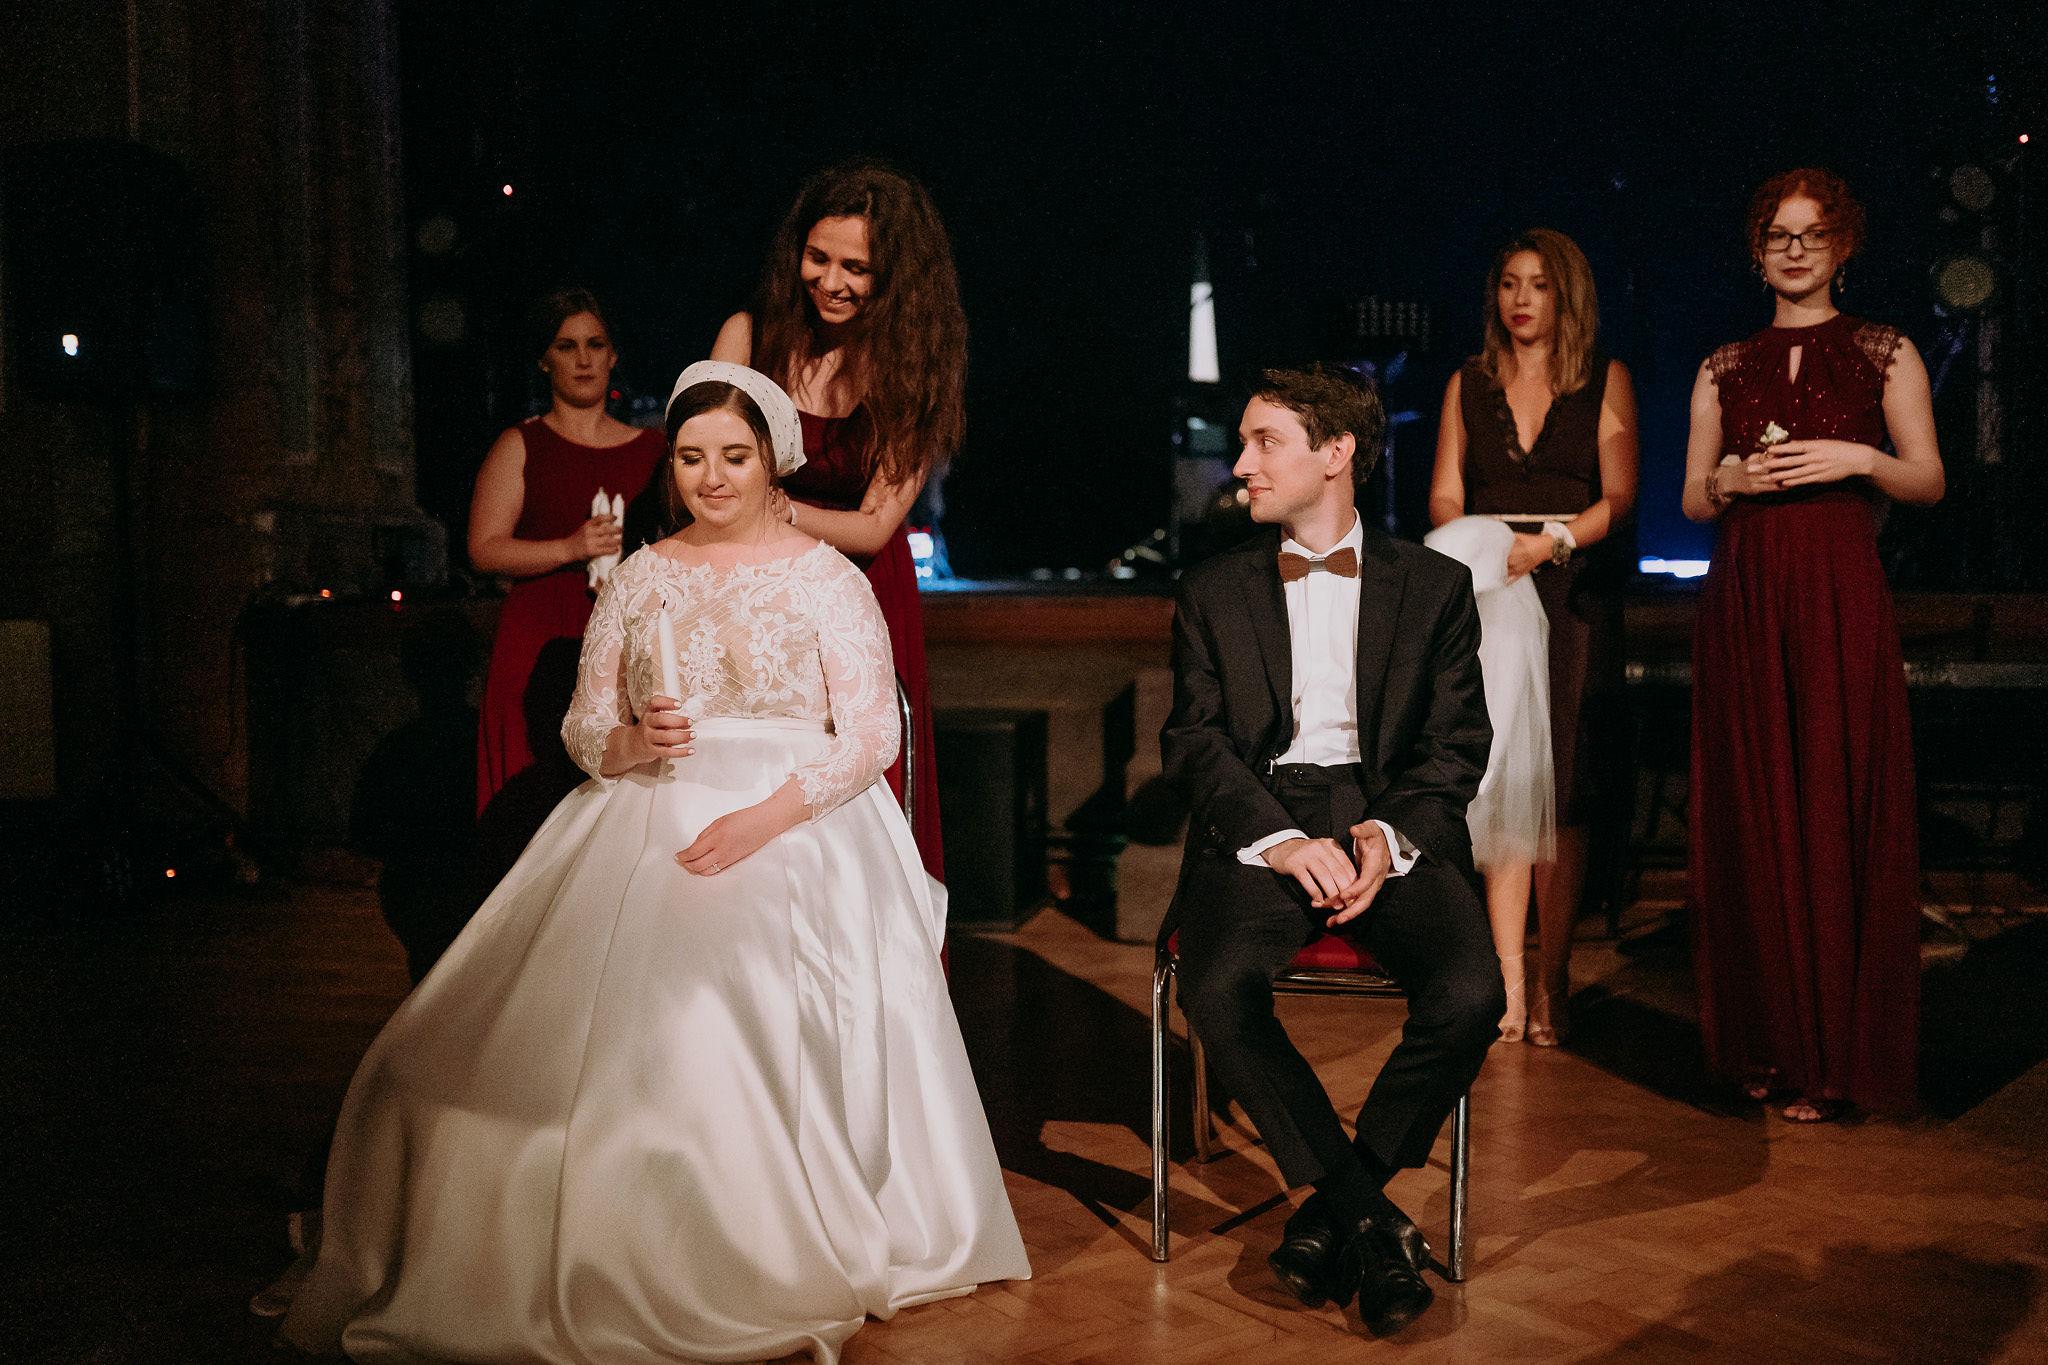 Svadba Hlohovec, Empirove divadlo 05 #svadobnyDJ, #djanasvadbu, #svadba, #svadbahlohovec, #Hlohovec #DJAnavi, #empirovedivadlo